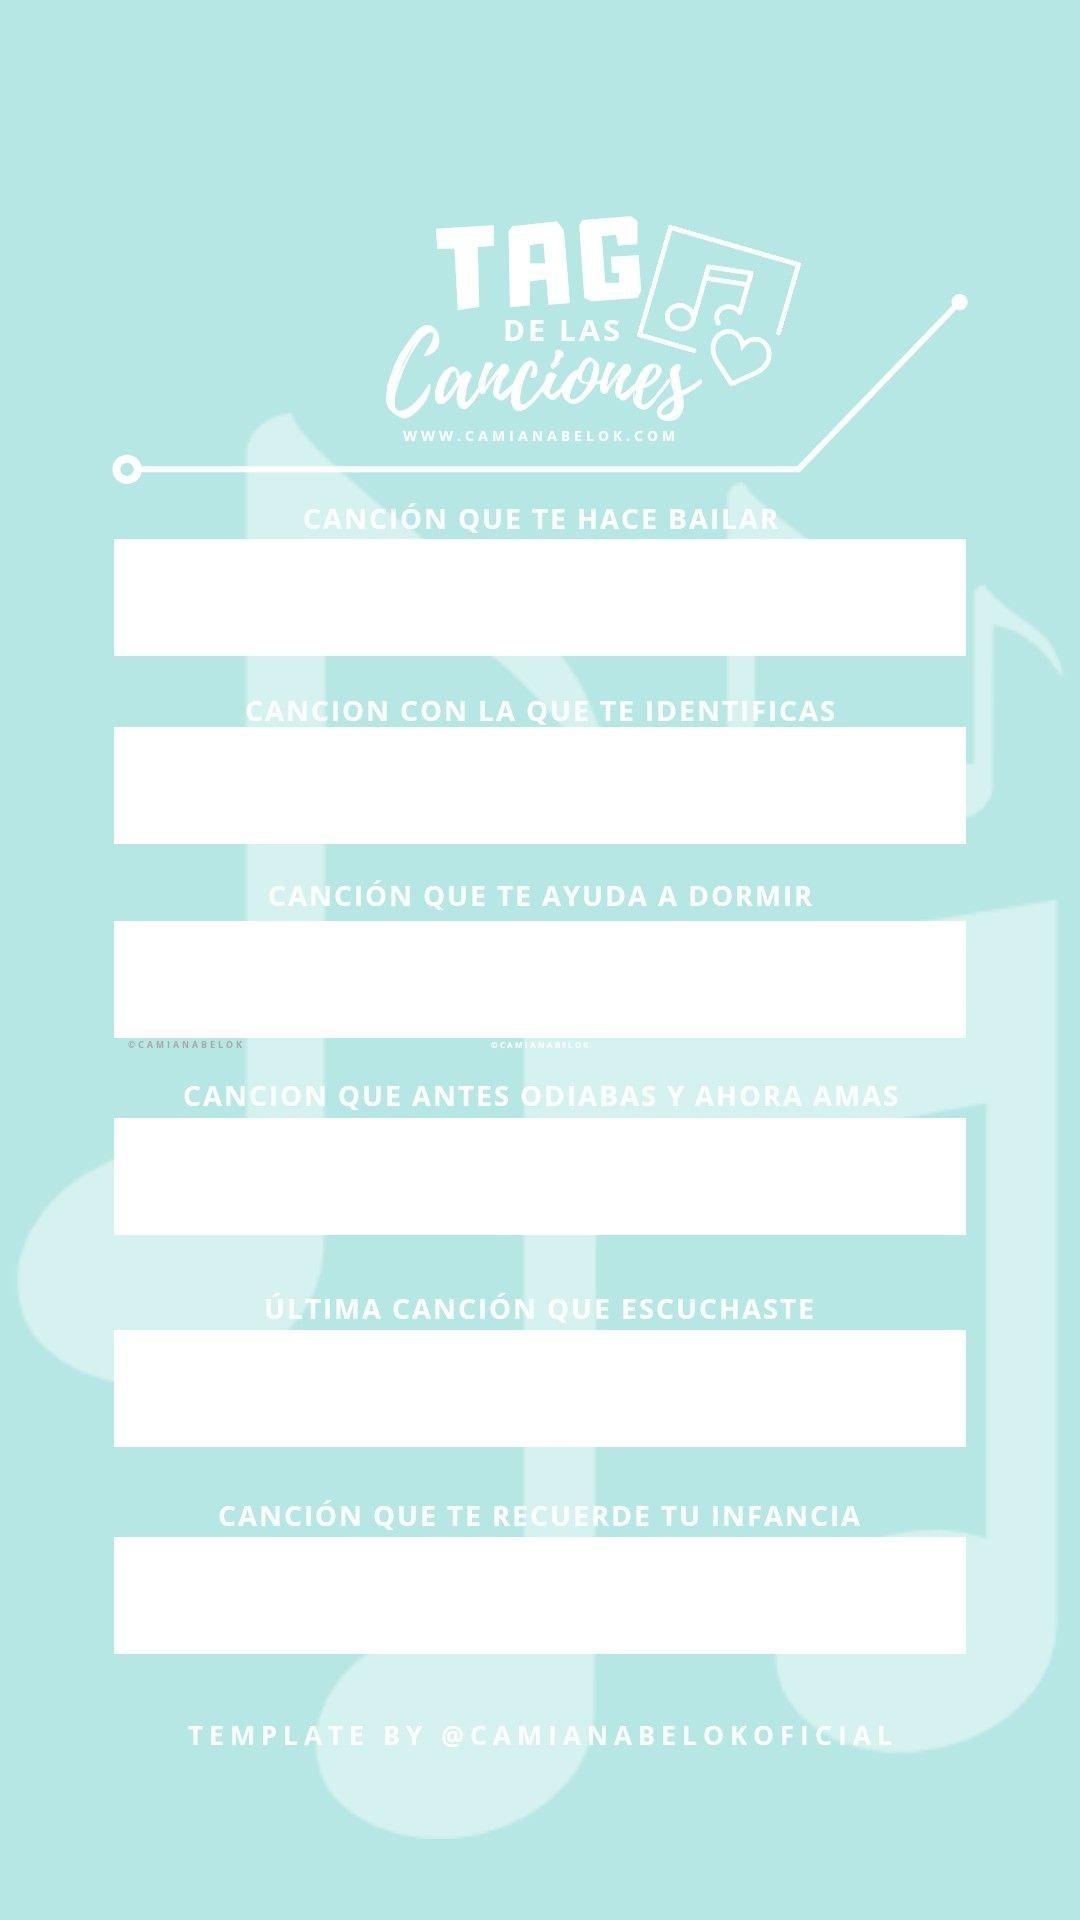 Imprimir Calendario 2019 Semanas Recientes Noticias Calendario 2019 Mexico Icial Of Imprimir Calendario 2019 Semanas Más Actual 22 Best Bullet Journals Images On Pinterest